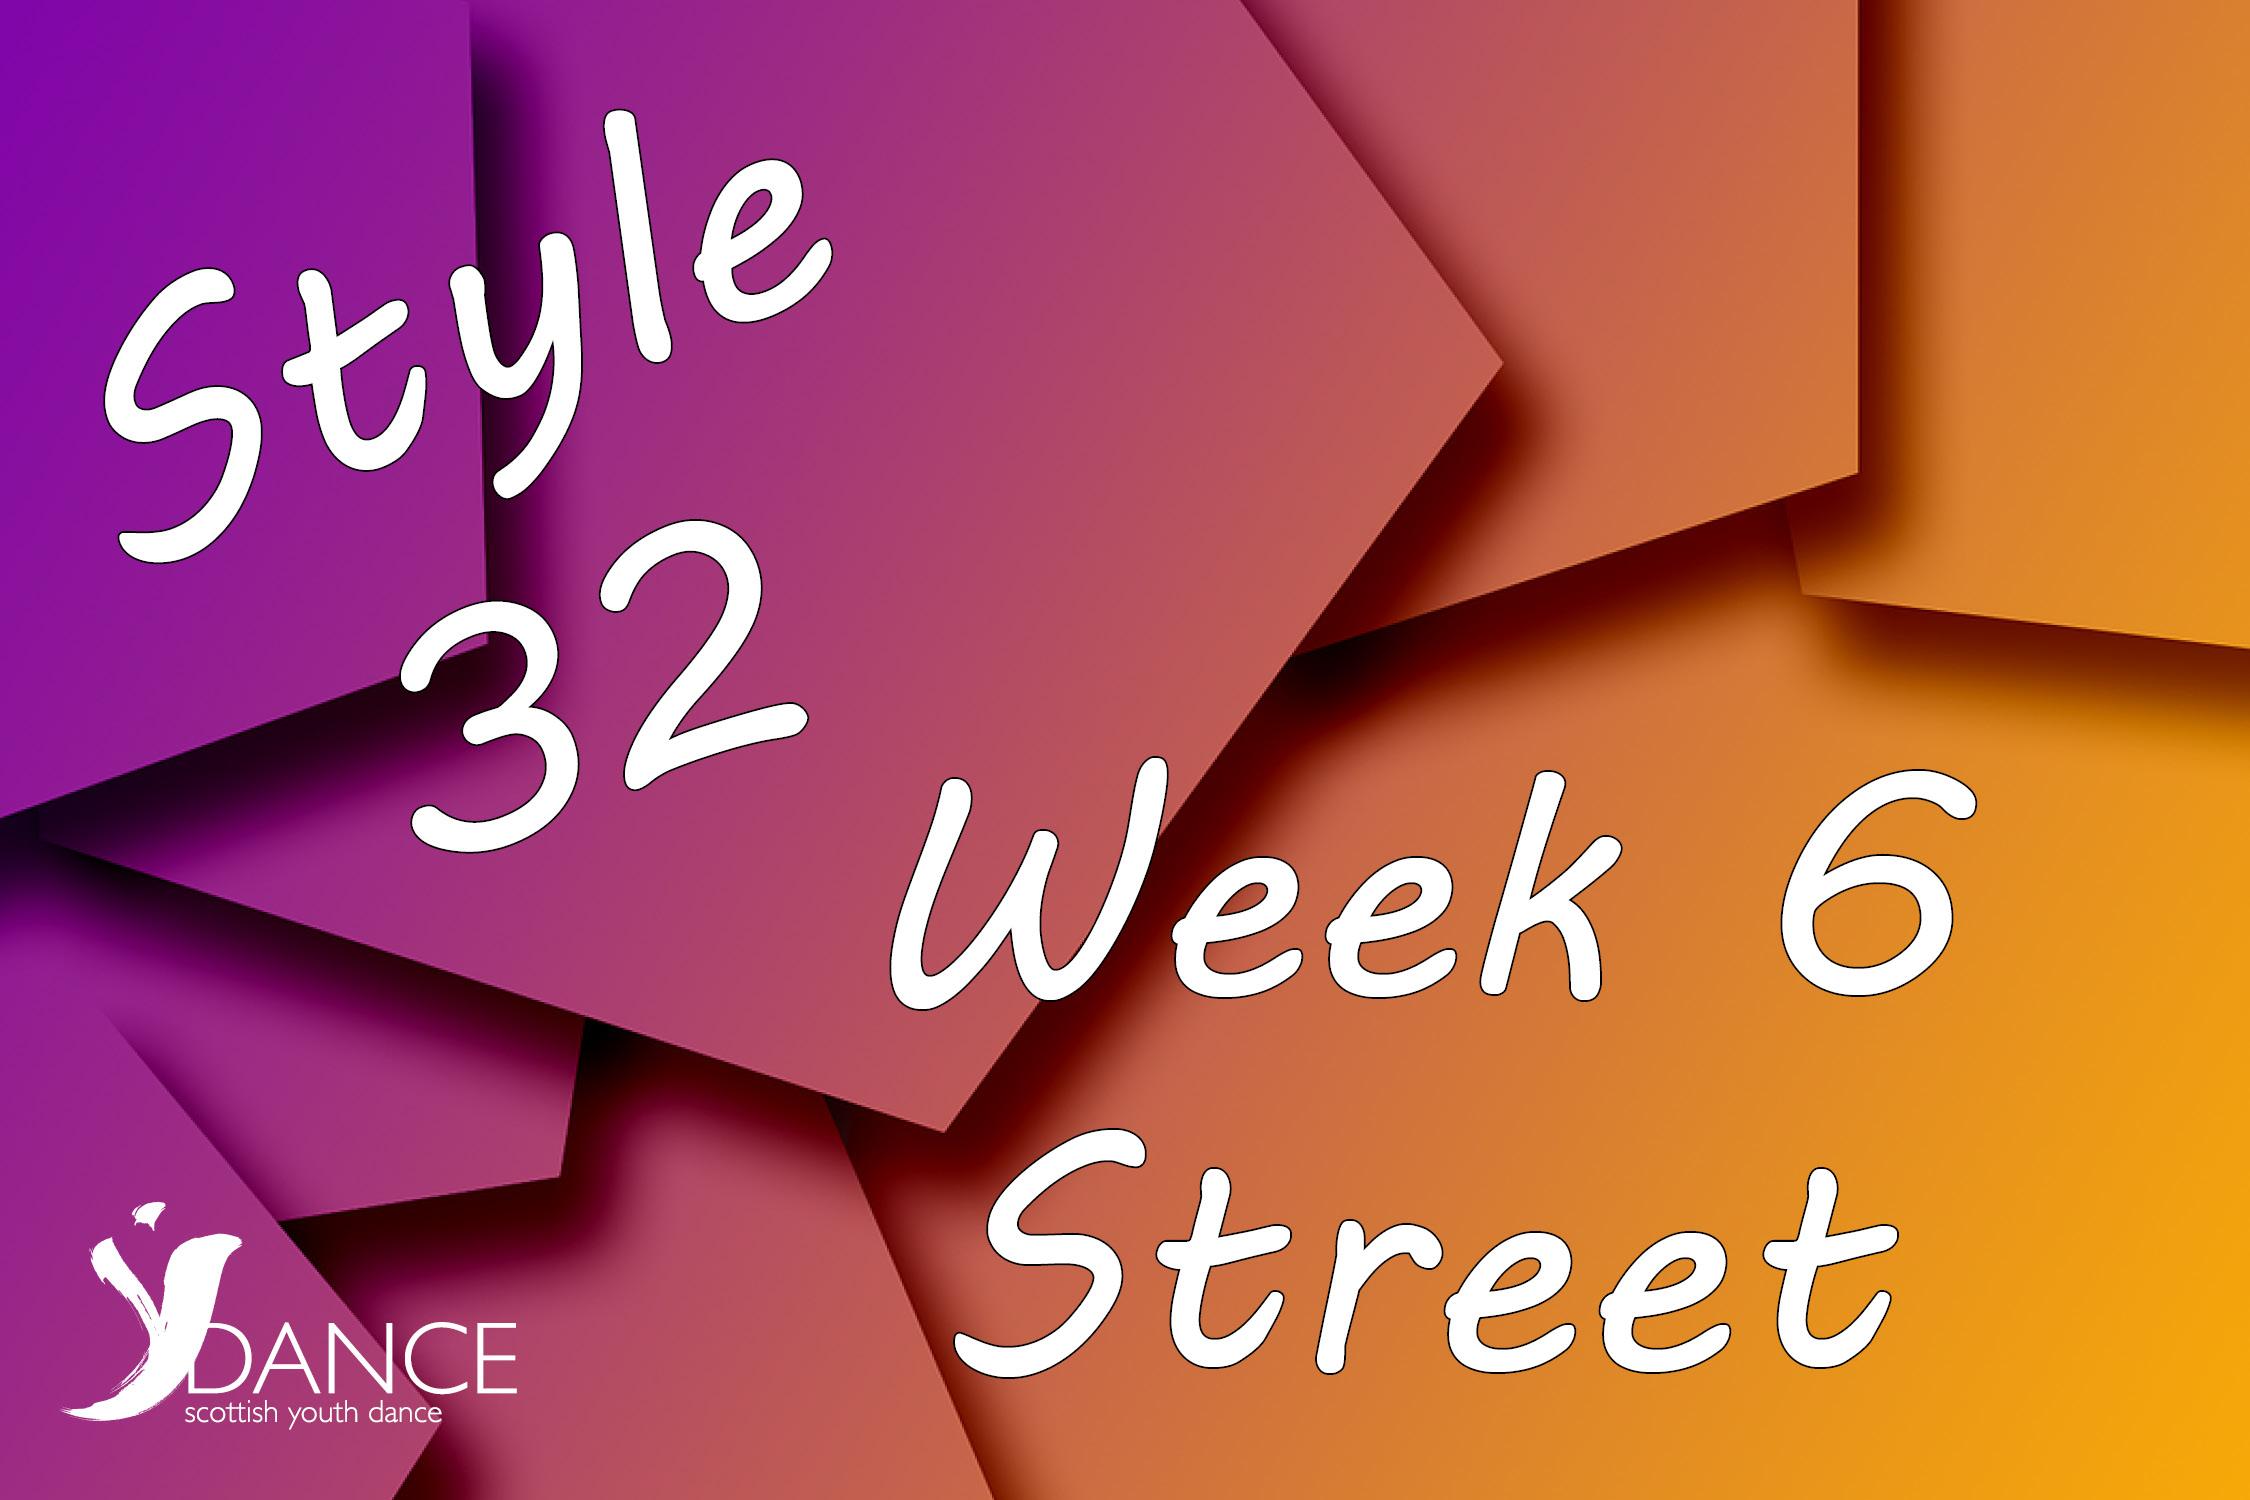 Style32 - Wk6 - Street